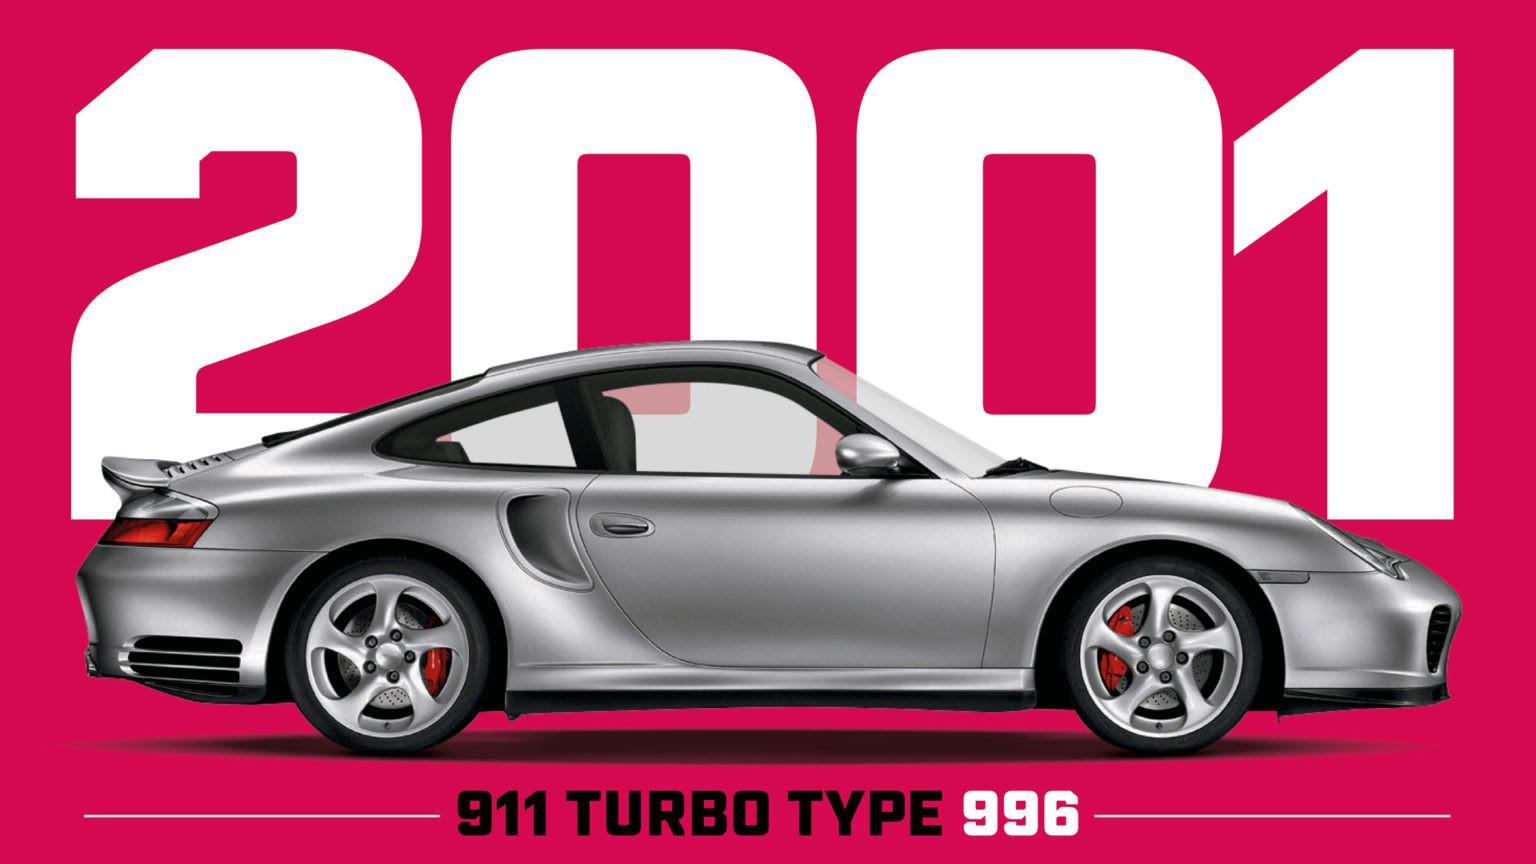 la-saga-porsche-911-turbo-le-guide-d-achat-1349-4.jpg